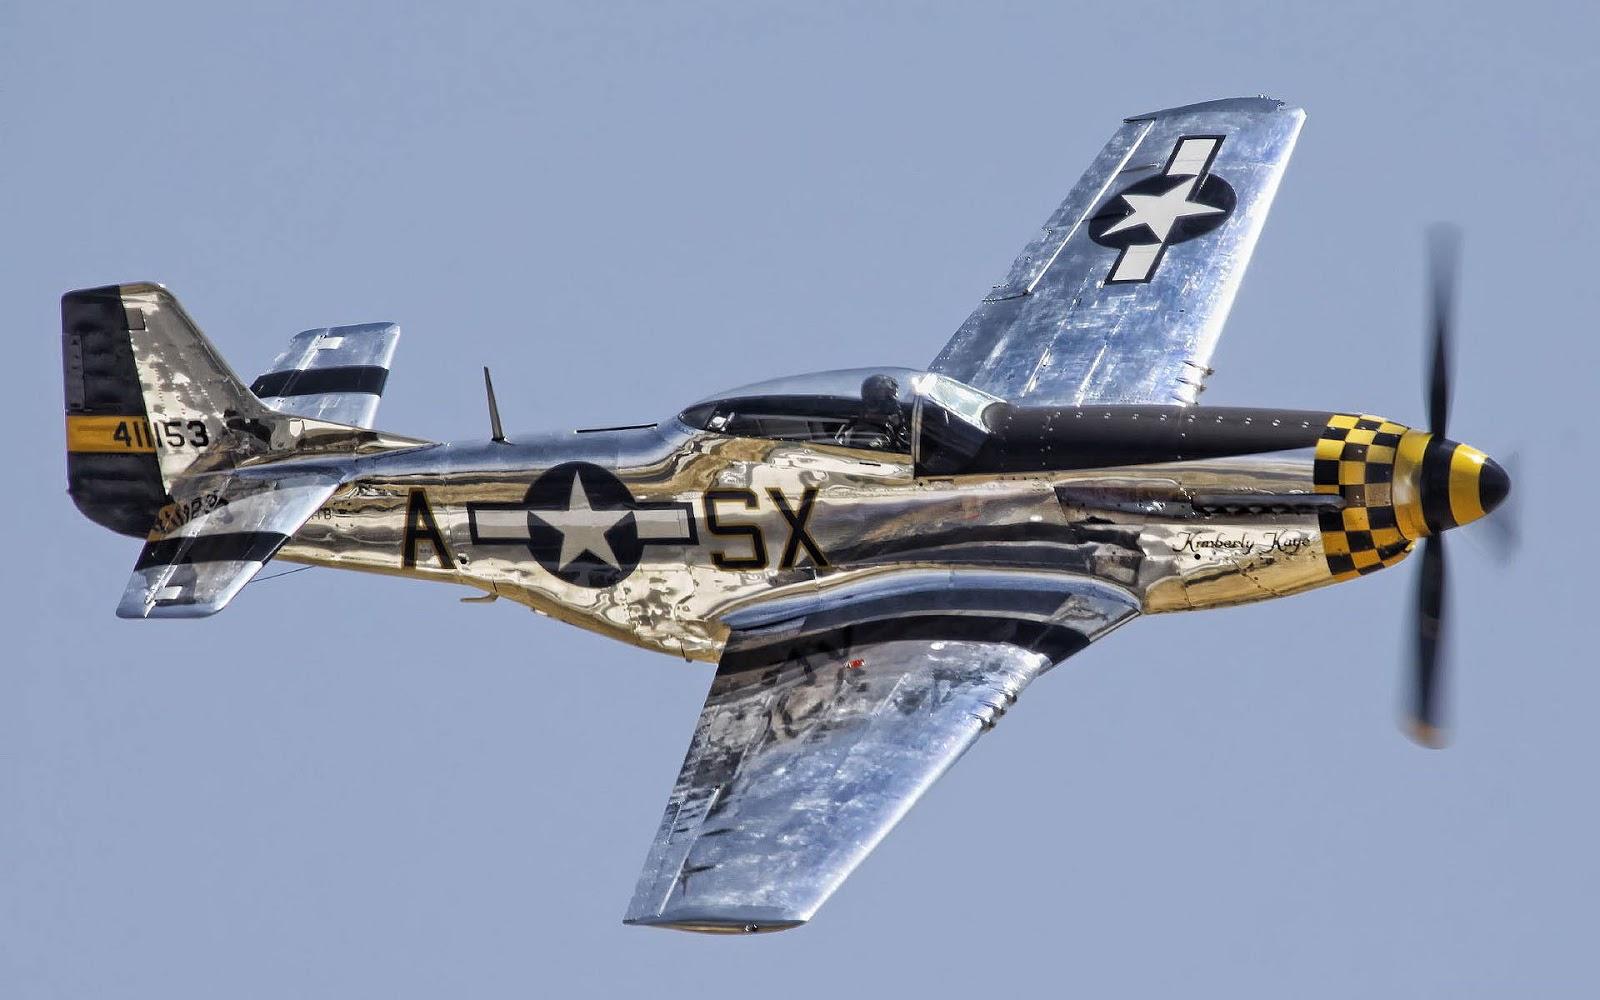 51 Mustang vliegtuig wallpaper Bureaublad achtergrondennl 1600x1000